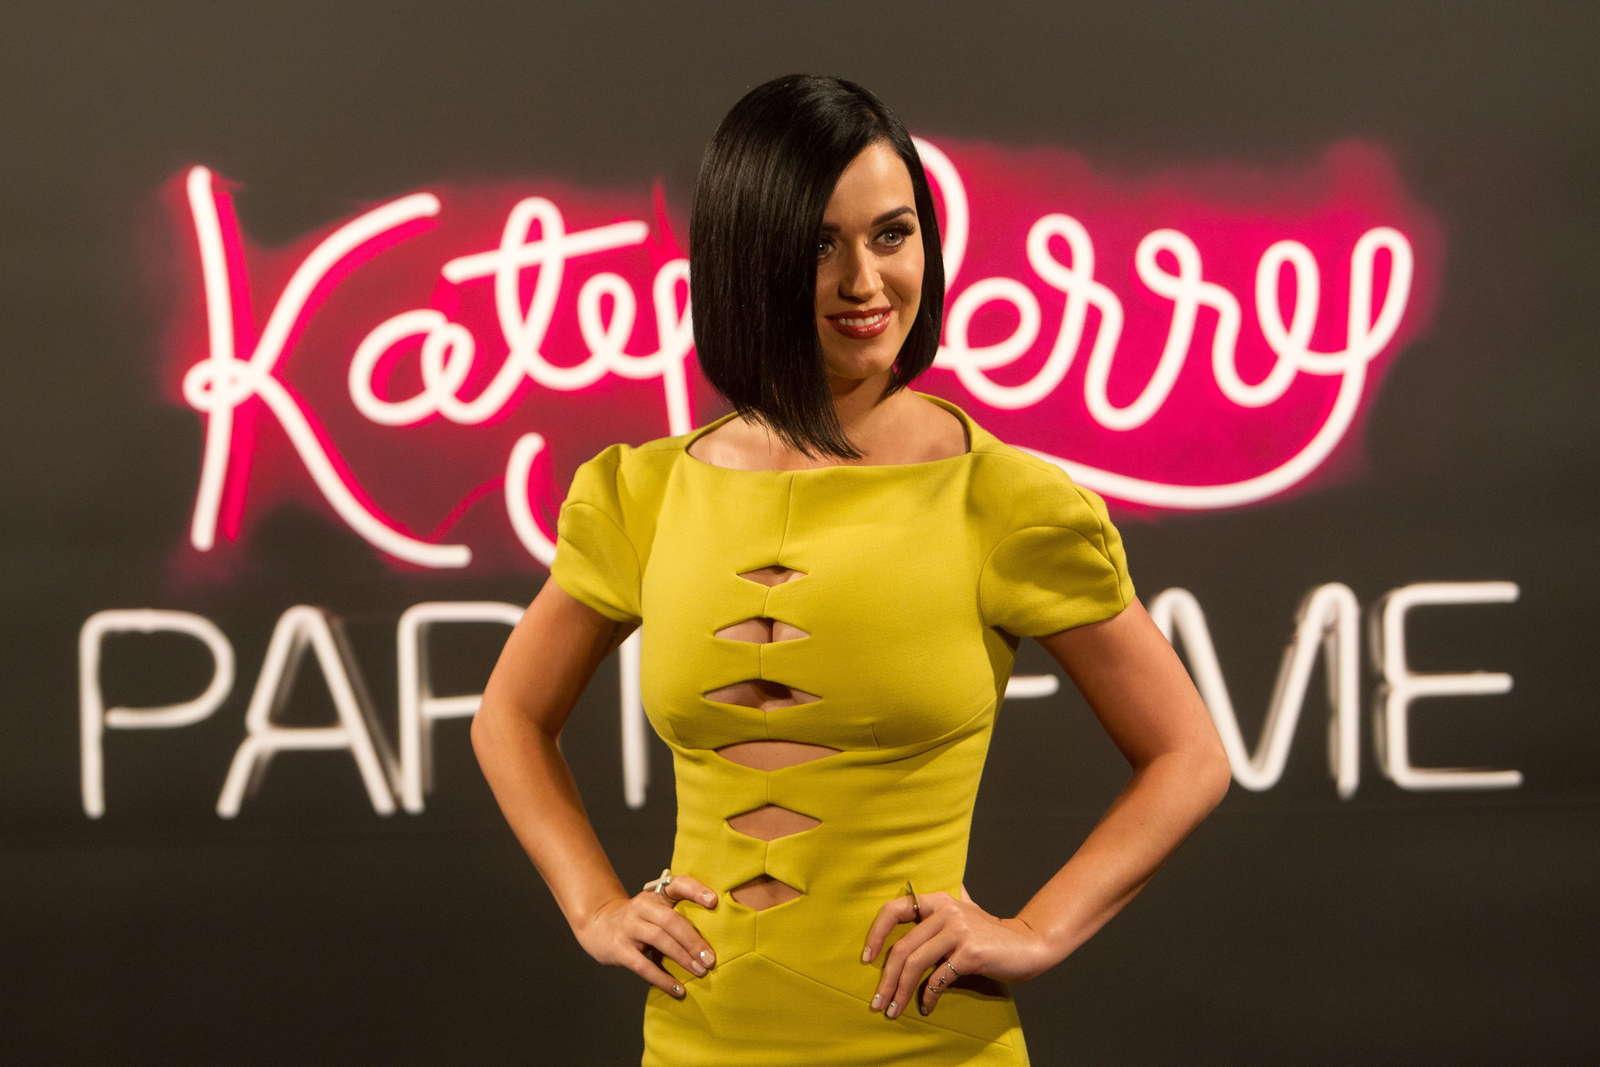 Katy Perry 2012 : katy-perry-photocall-part-of-me-in-rio-de-janeiro-03